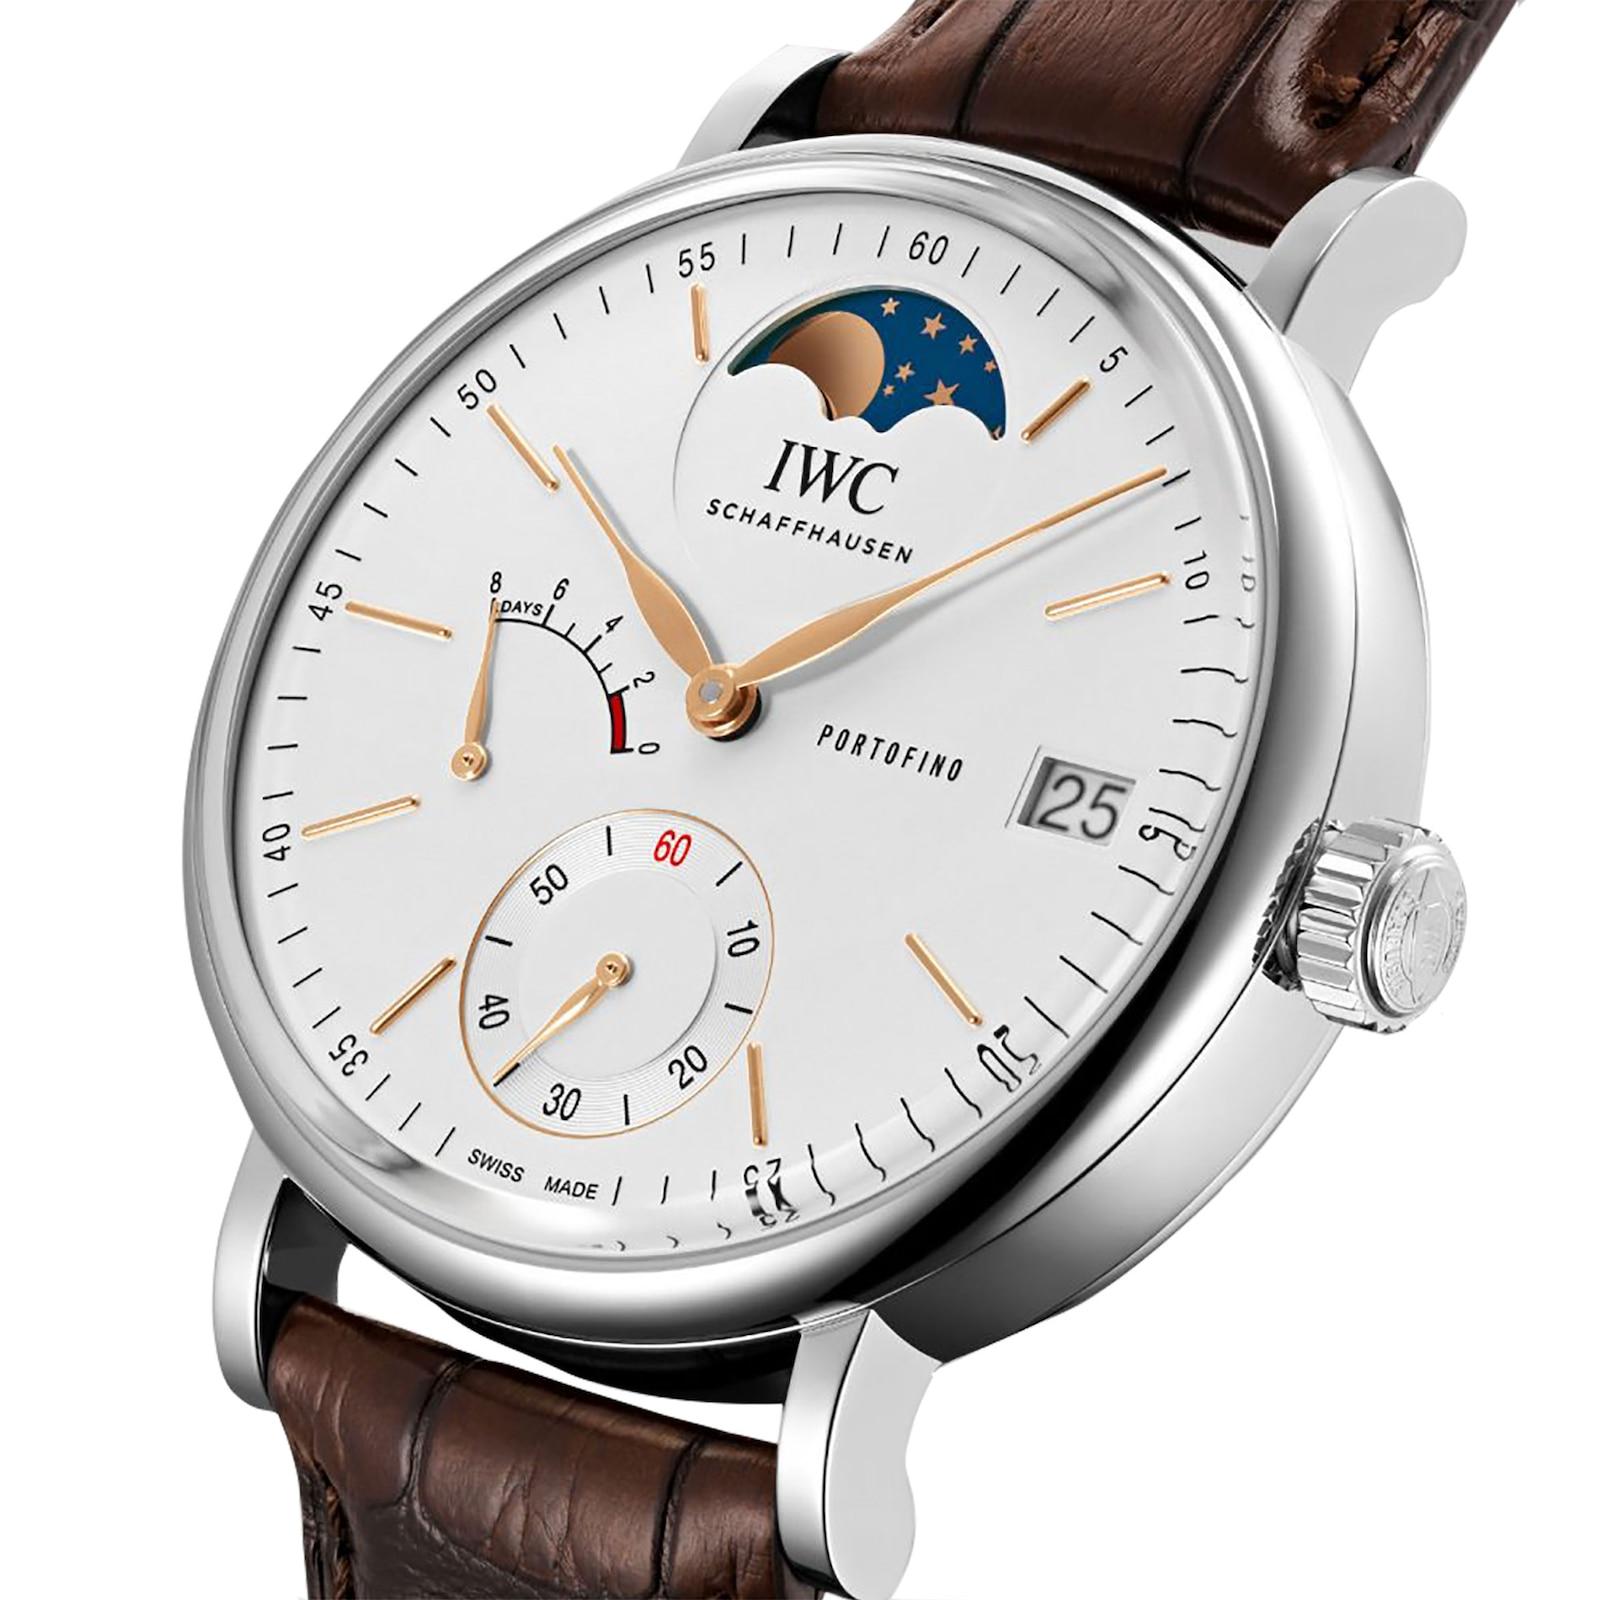 IWC Portofino Hand-Wound Moon Phase Mens Watch